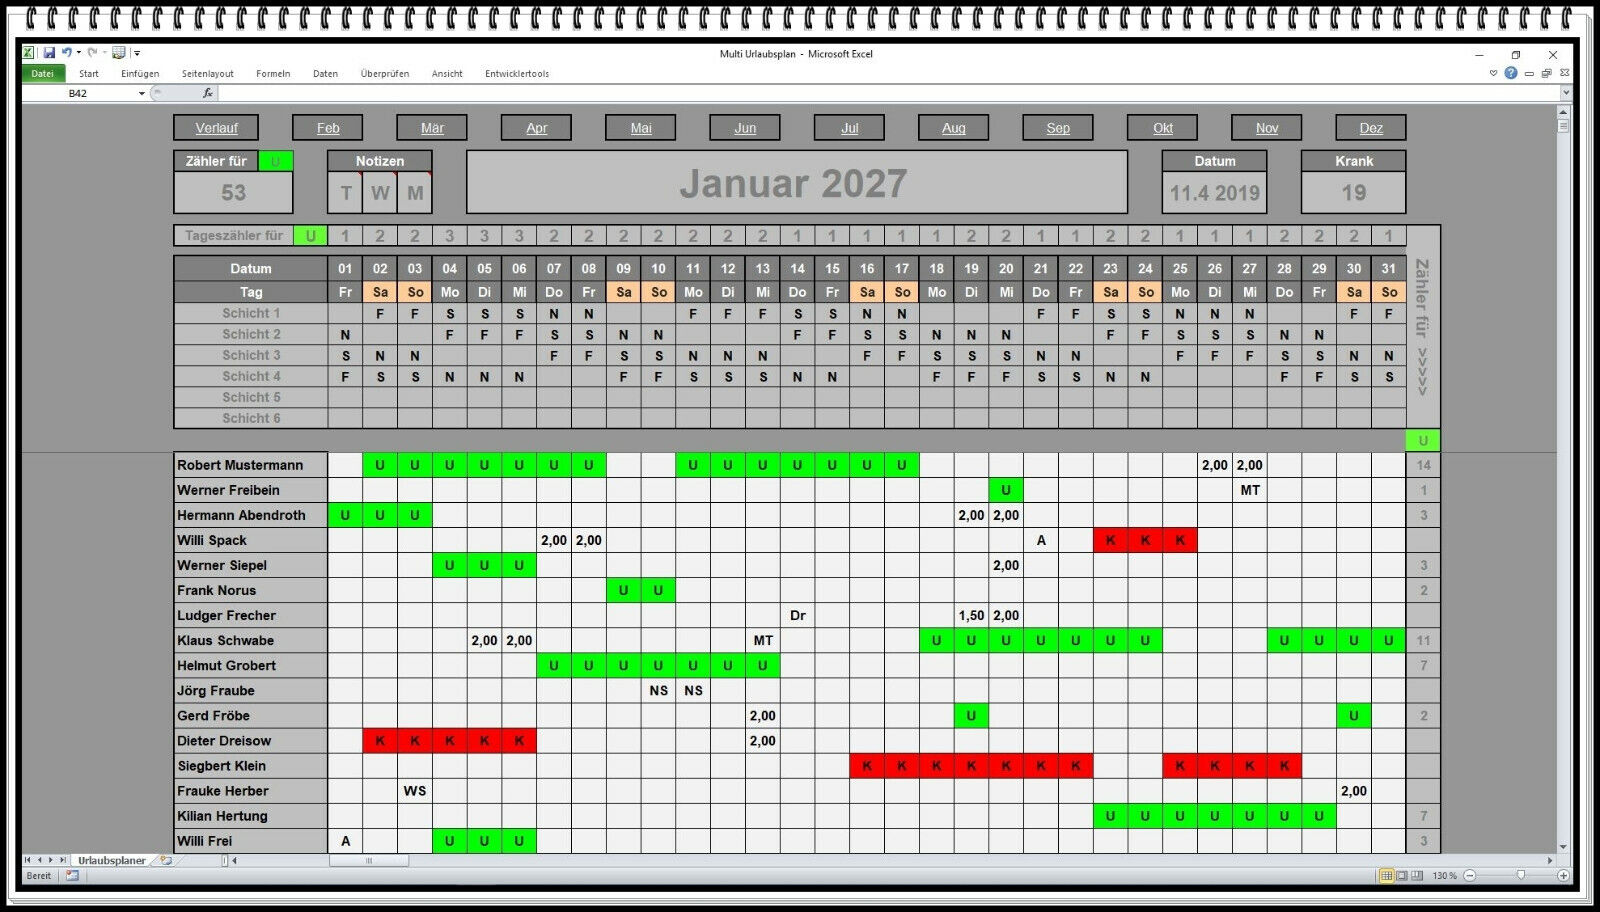 Urlaubsplaner Dienstplaner Schichtplaner MS Excel Software App bis 6 Schichten